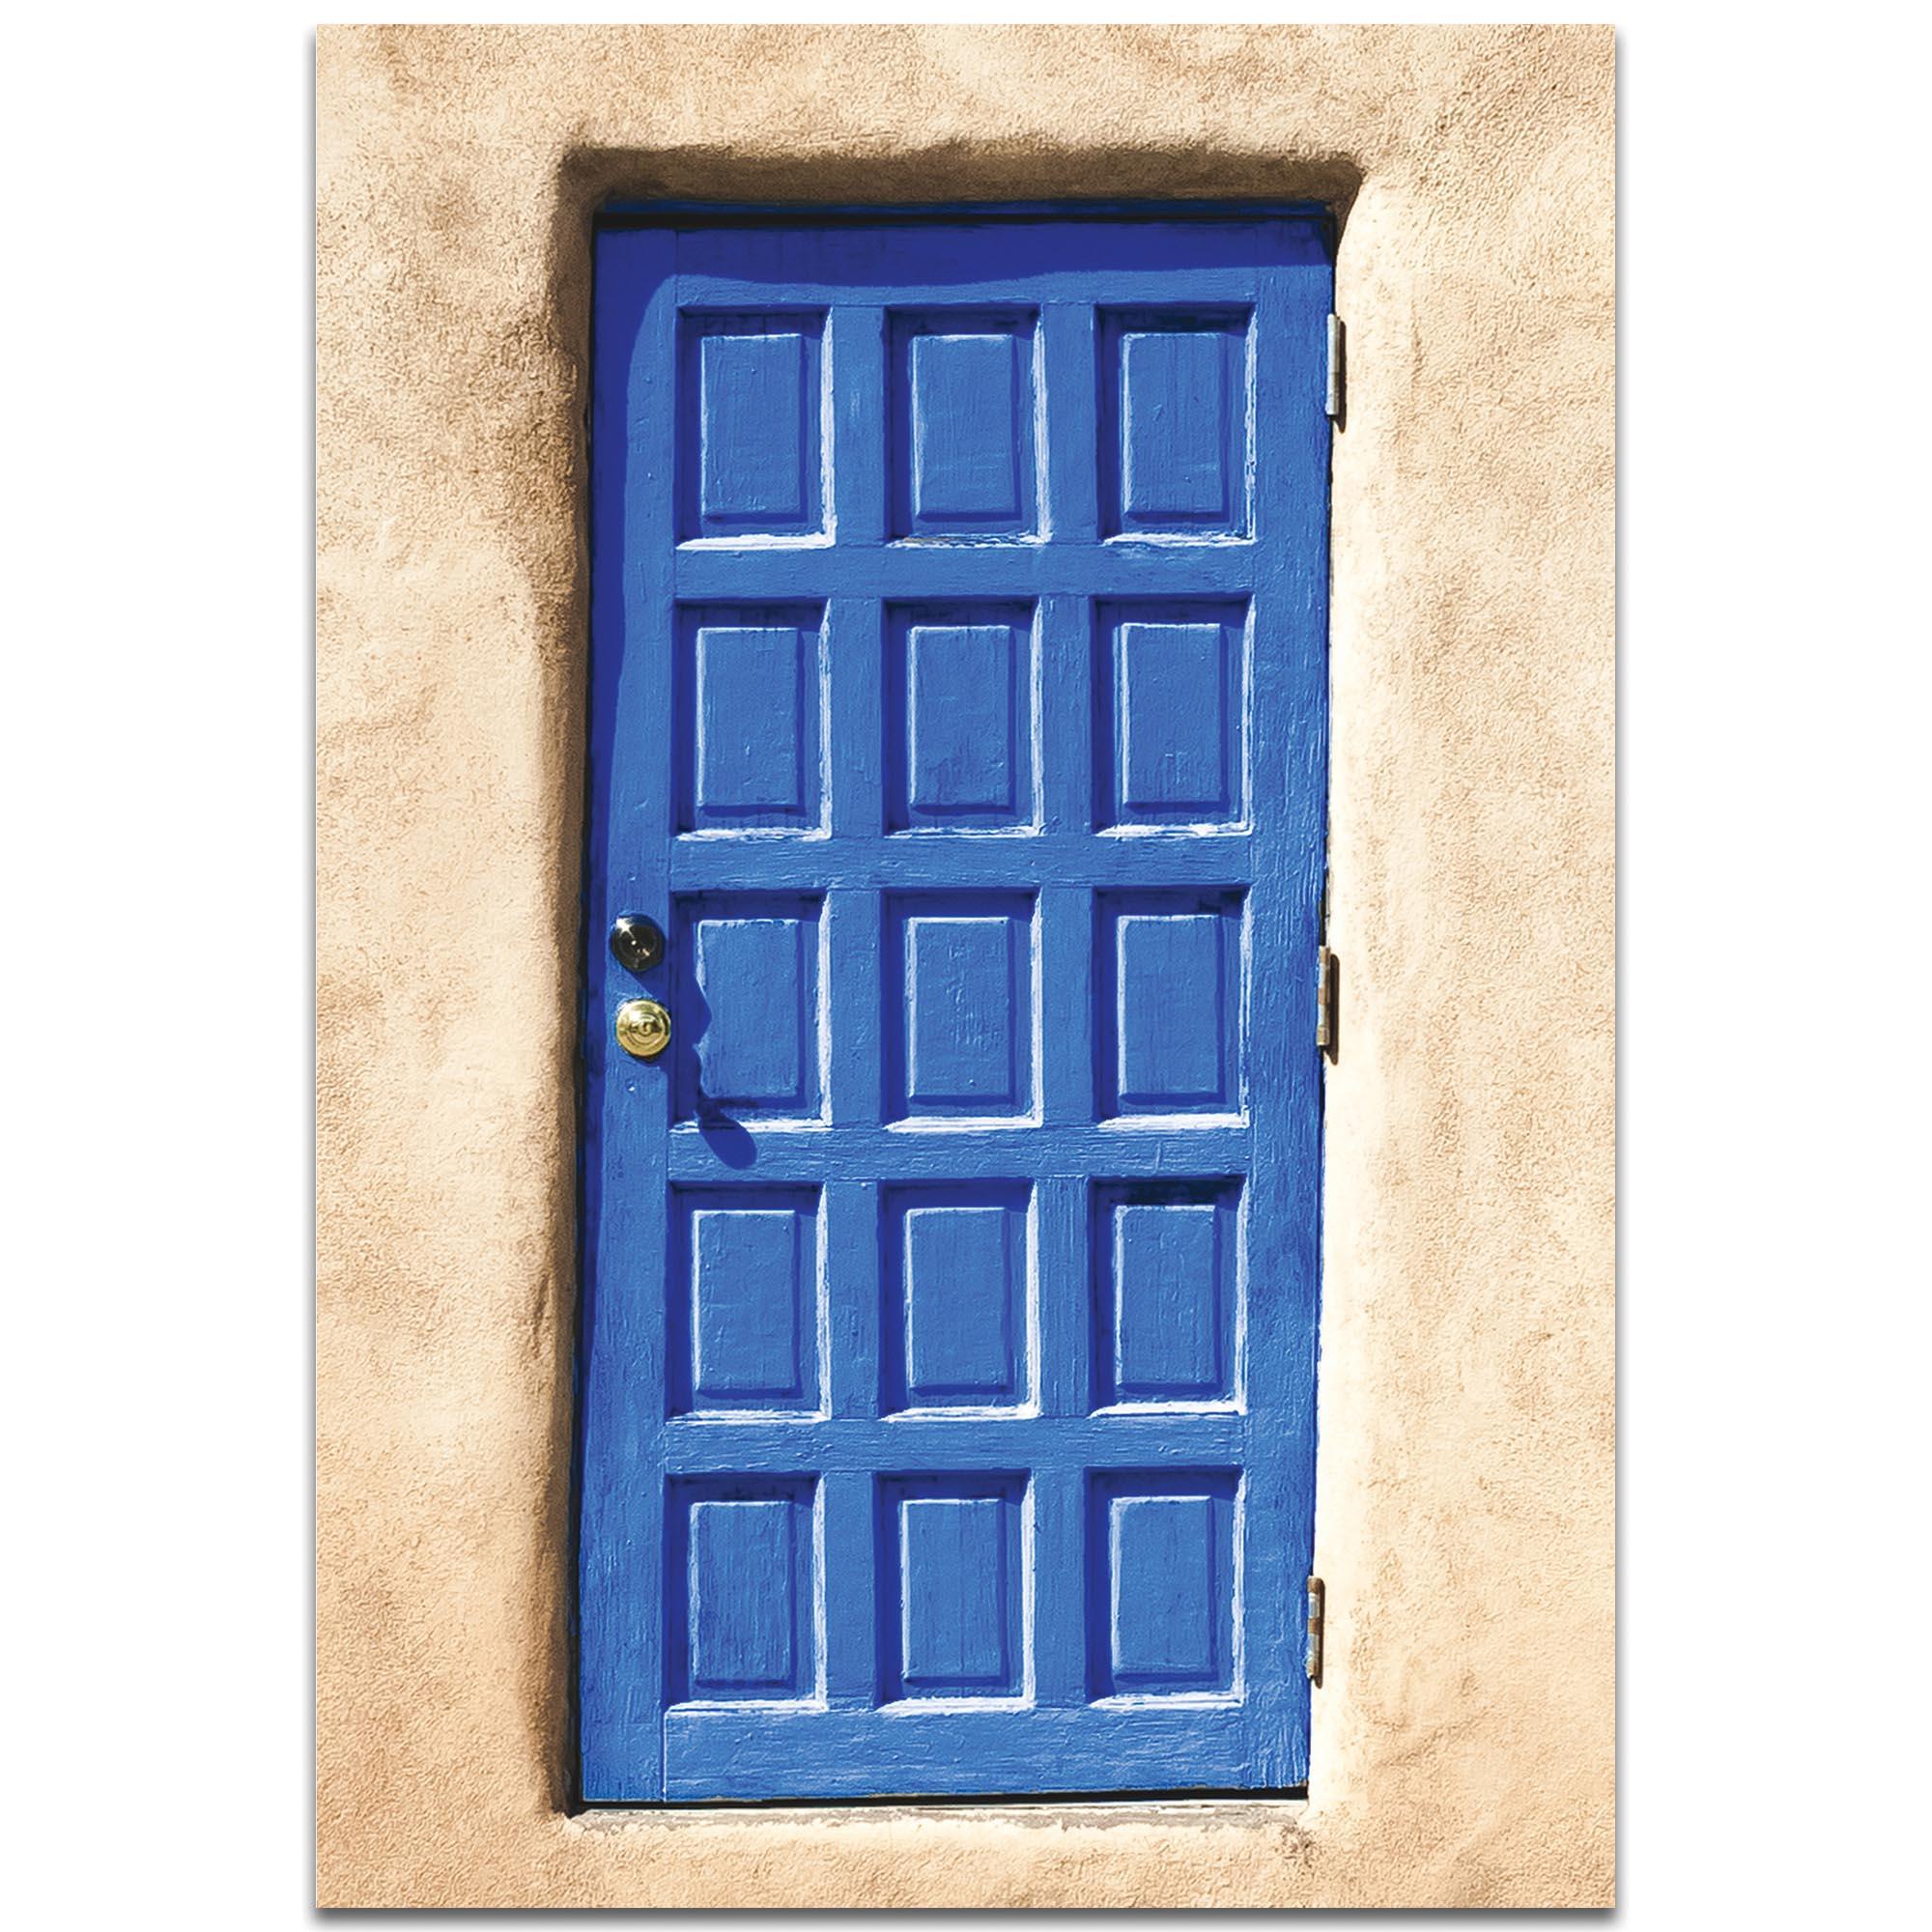 Eclectic Wall Art 'Blue Door' - Architecture Decor on Metal or Plexiglass